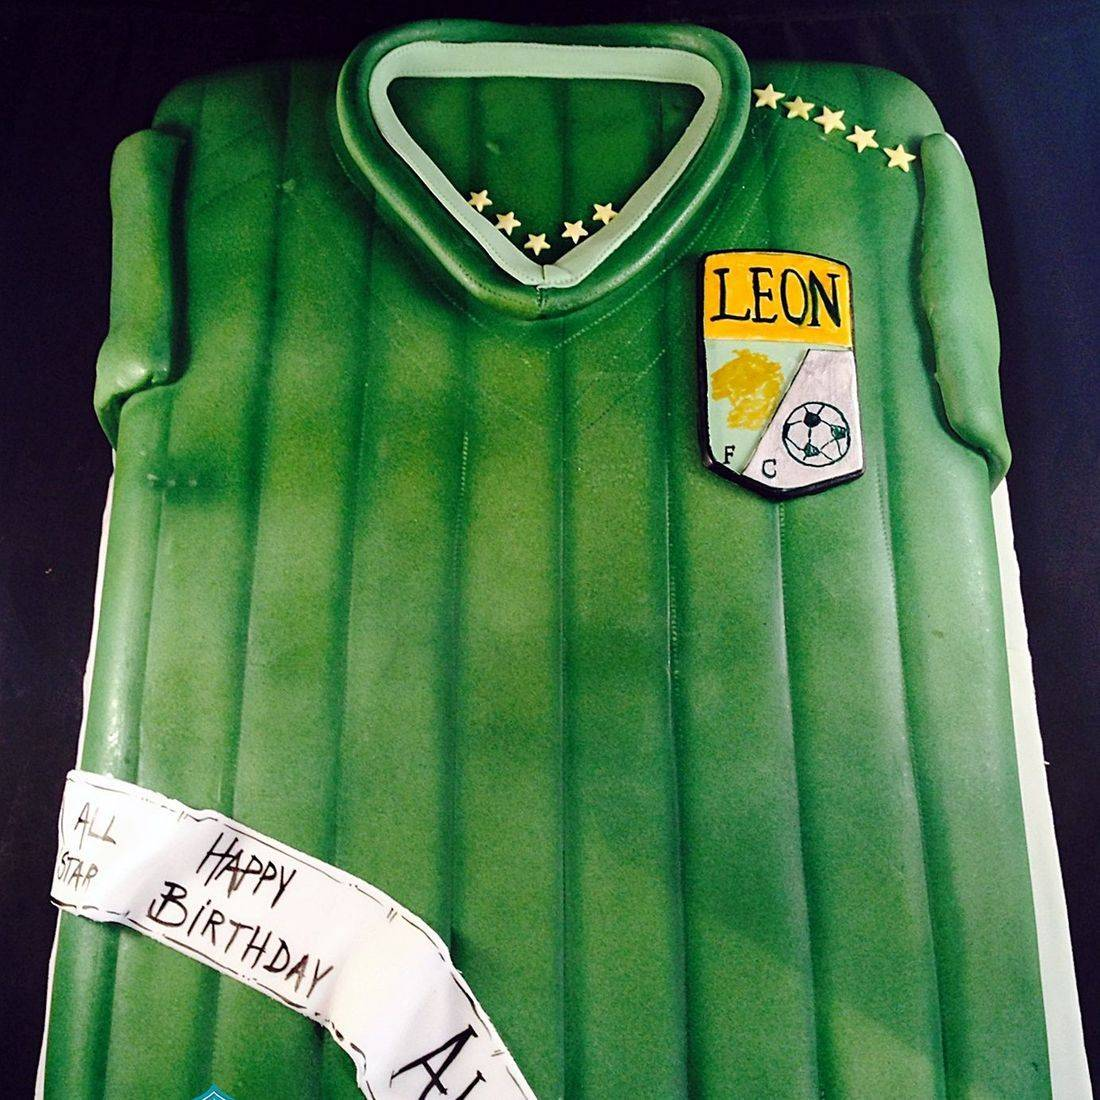 Leon Shirt Cake Dimensional Cake Milwaukee